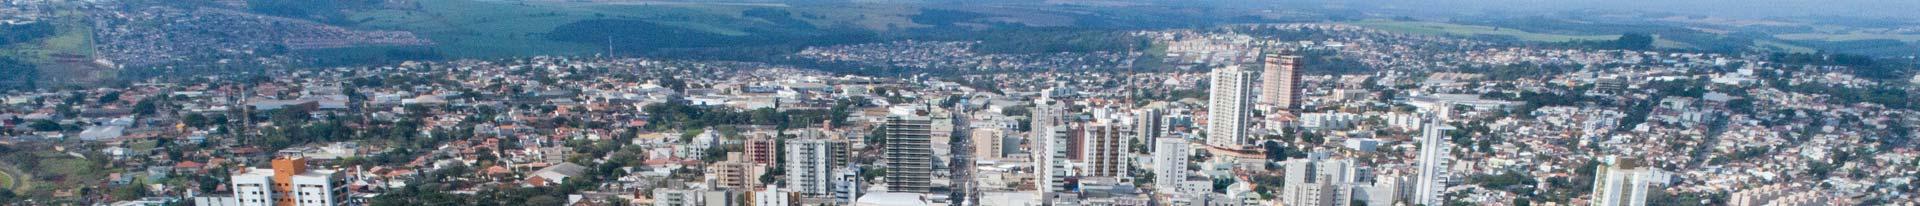 Foto aérea de Apucarana